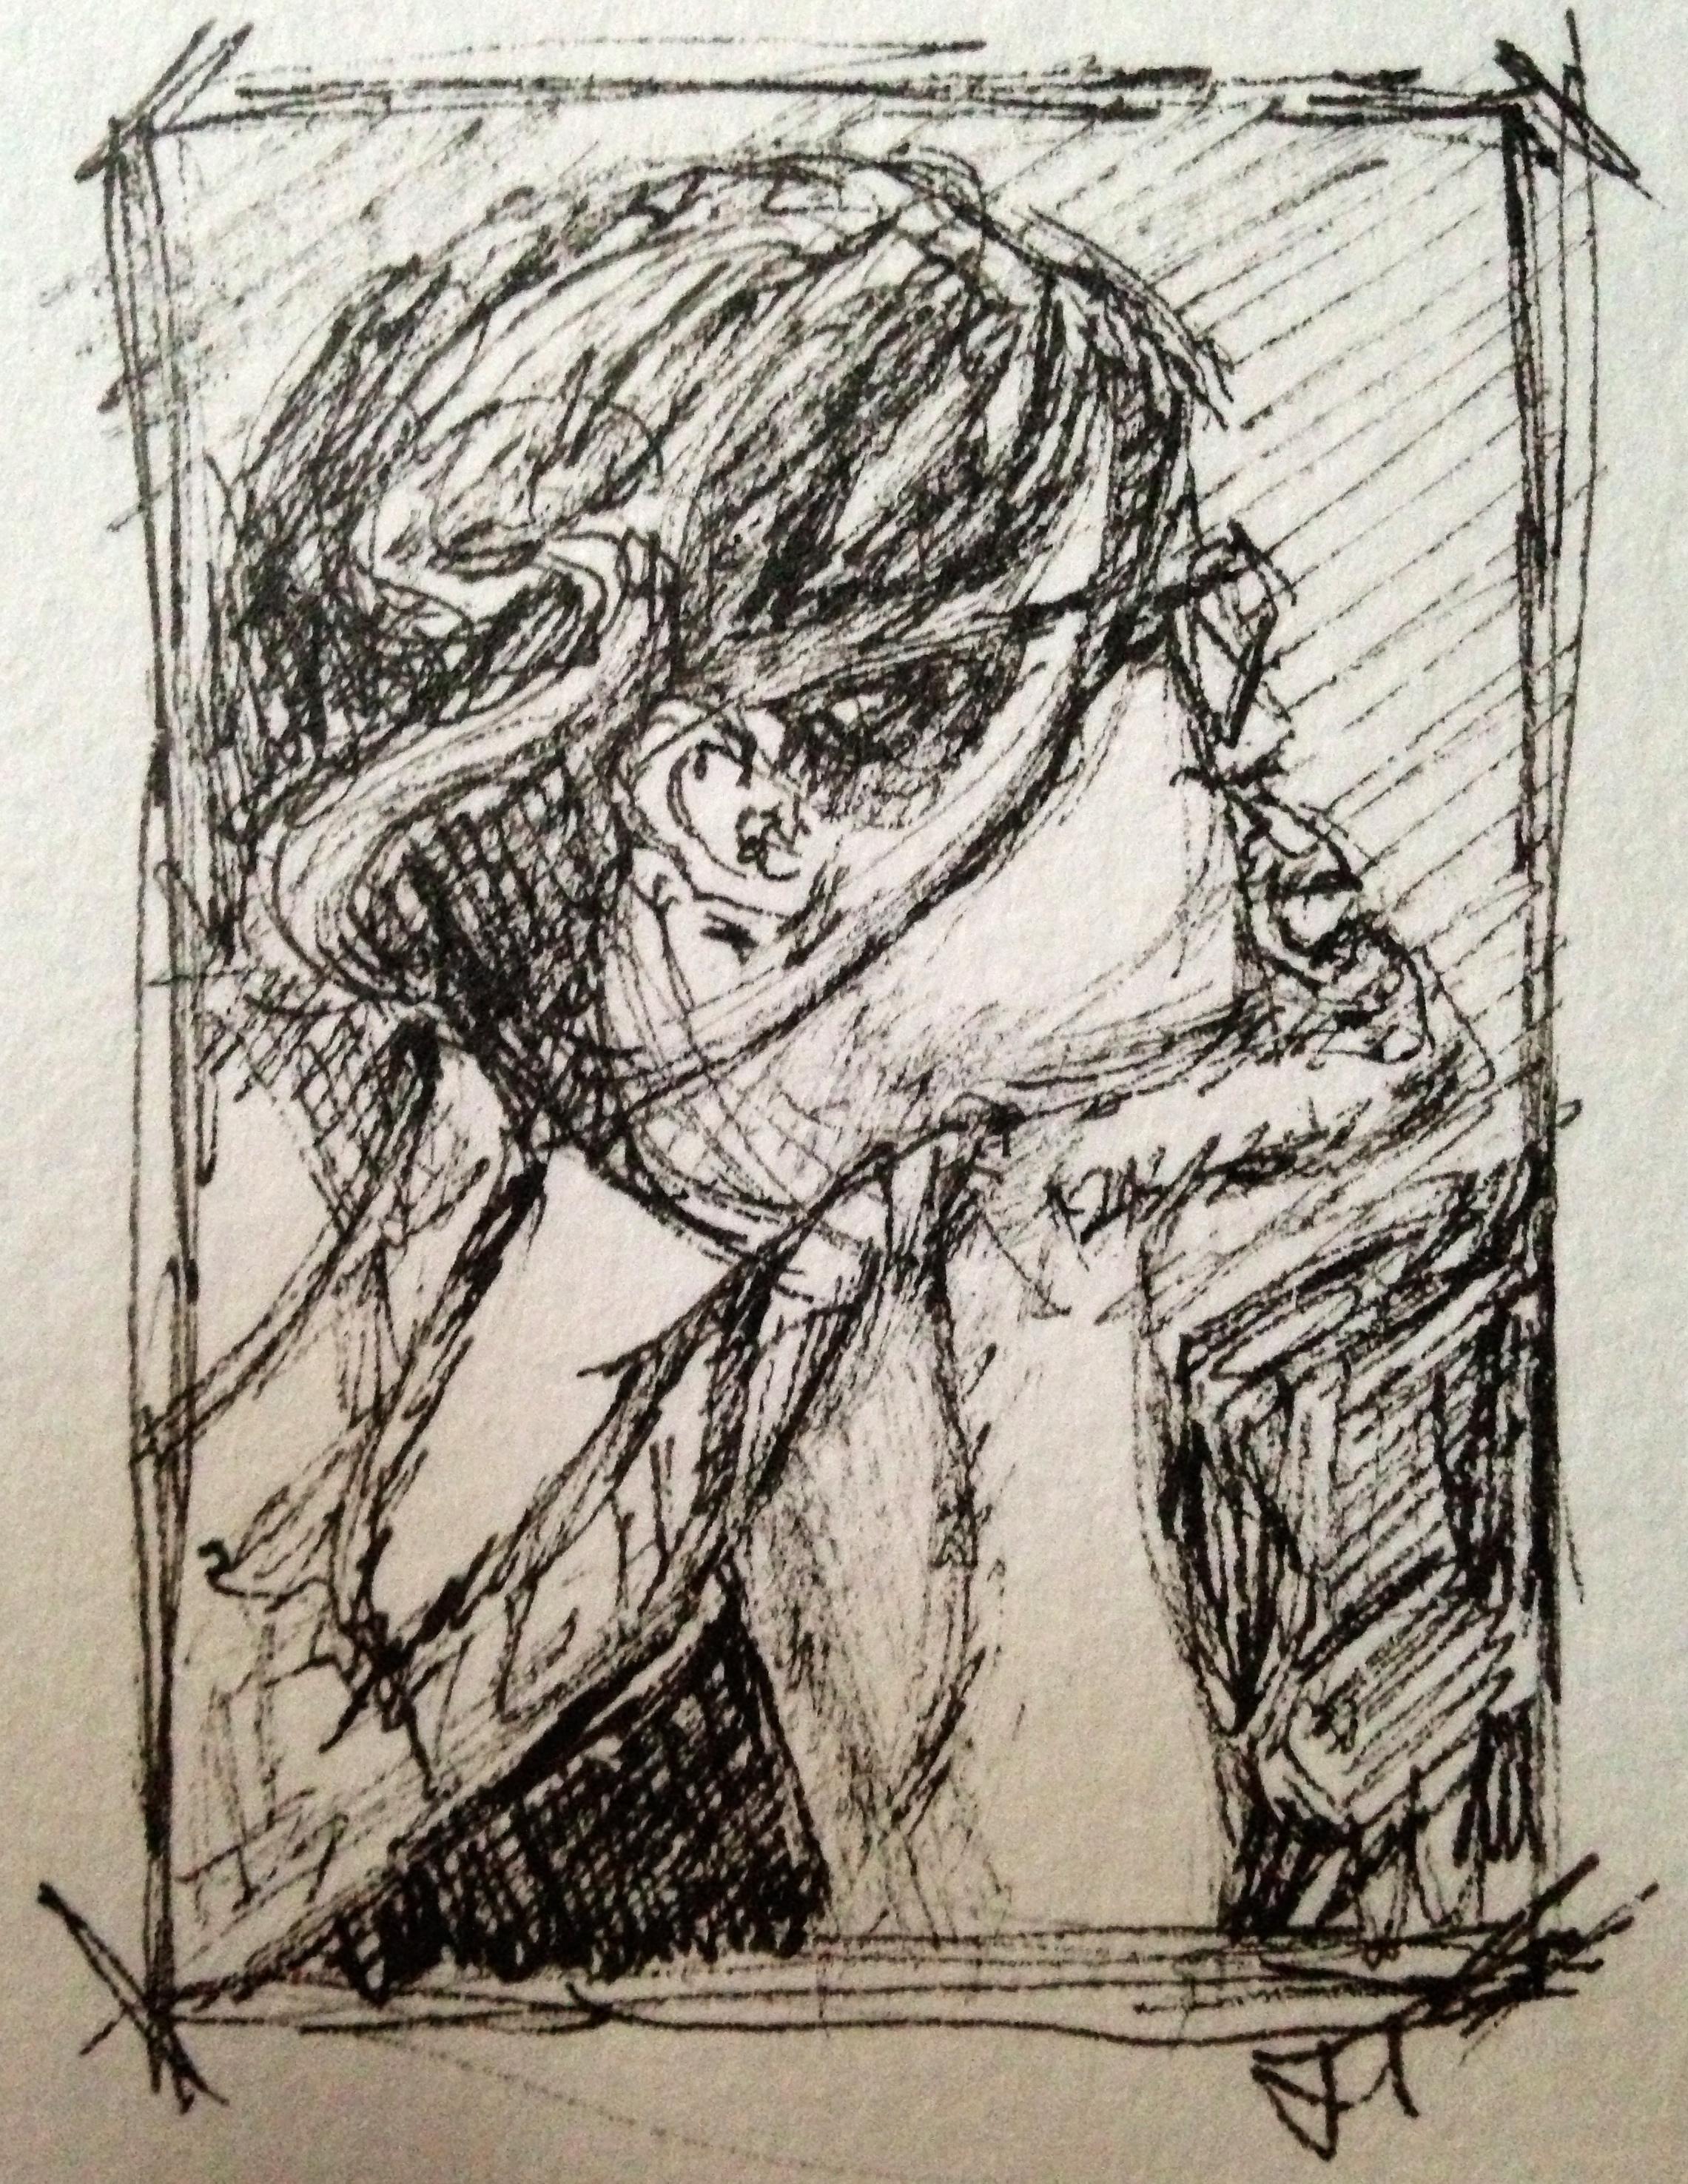 Sketchbook Journal - Grace Pondering